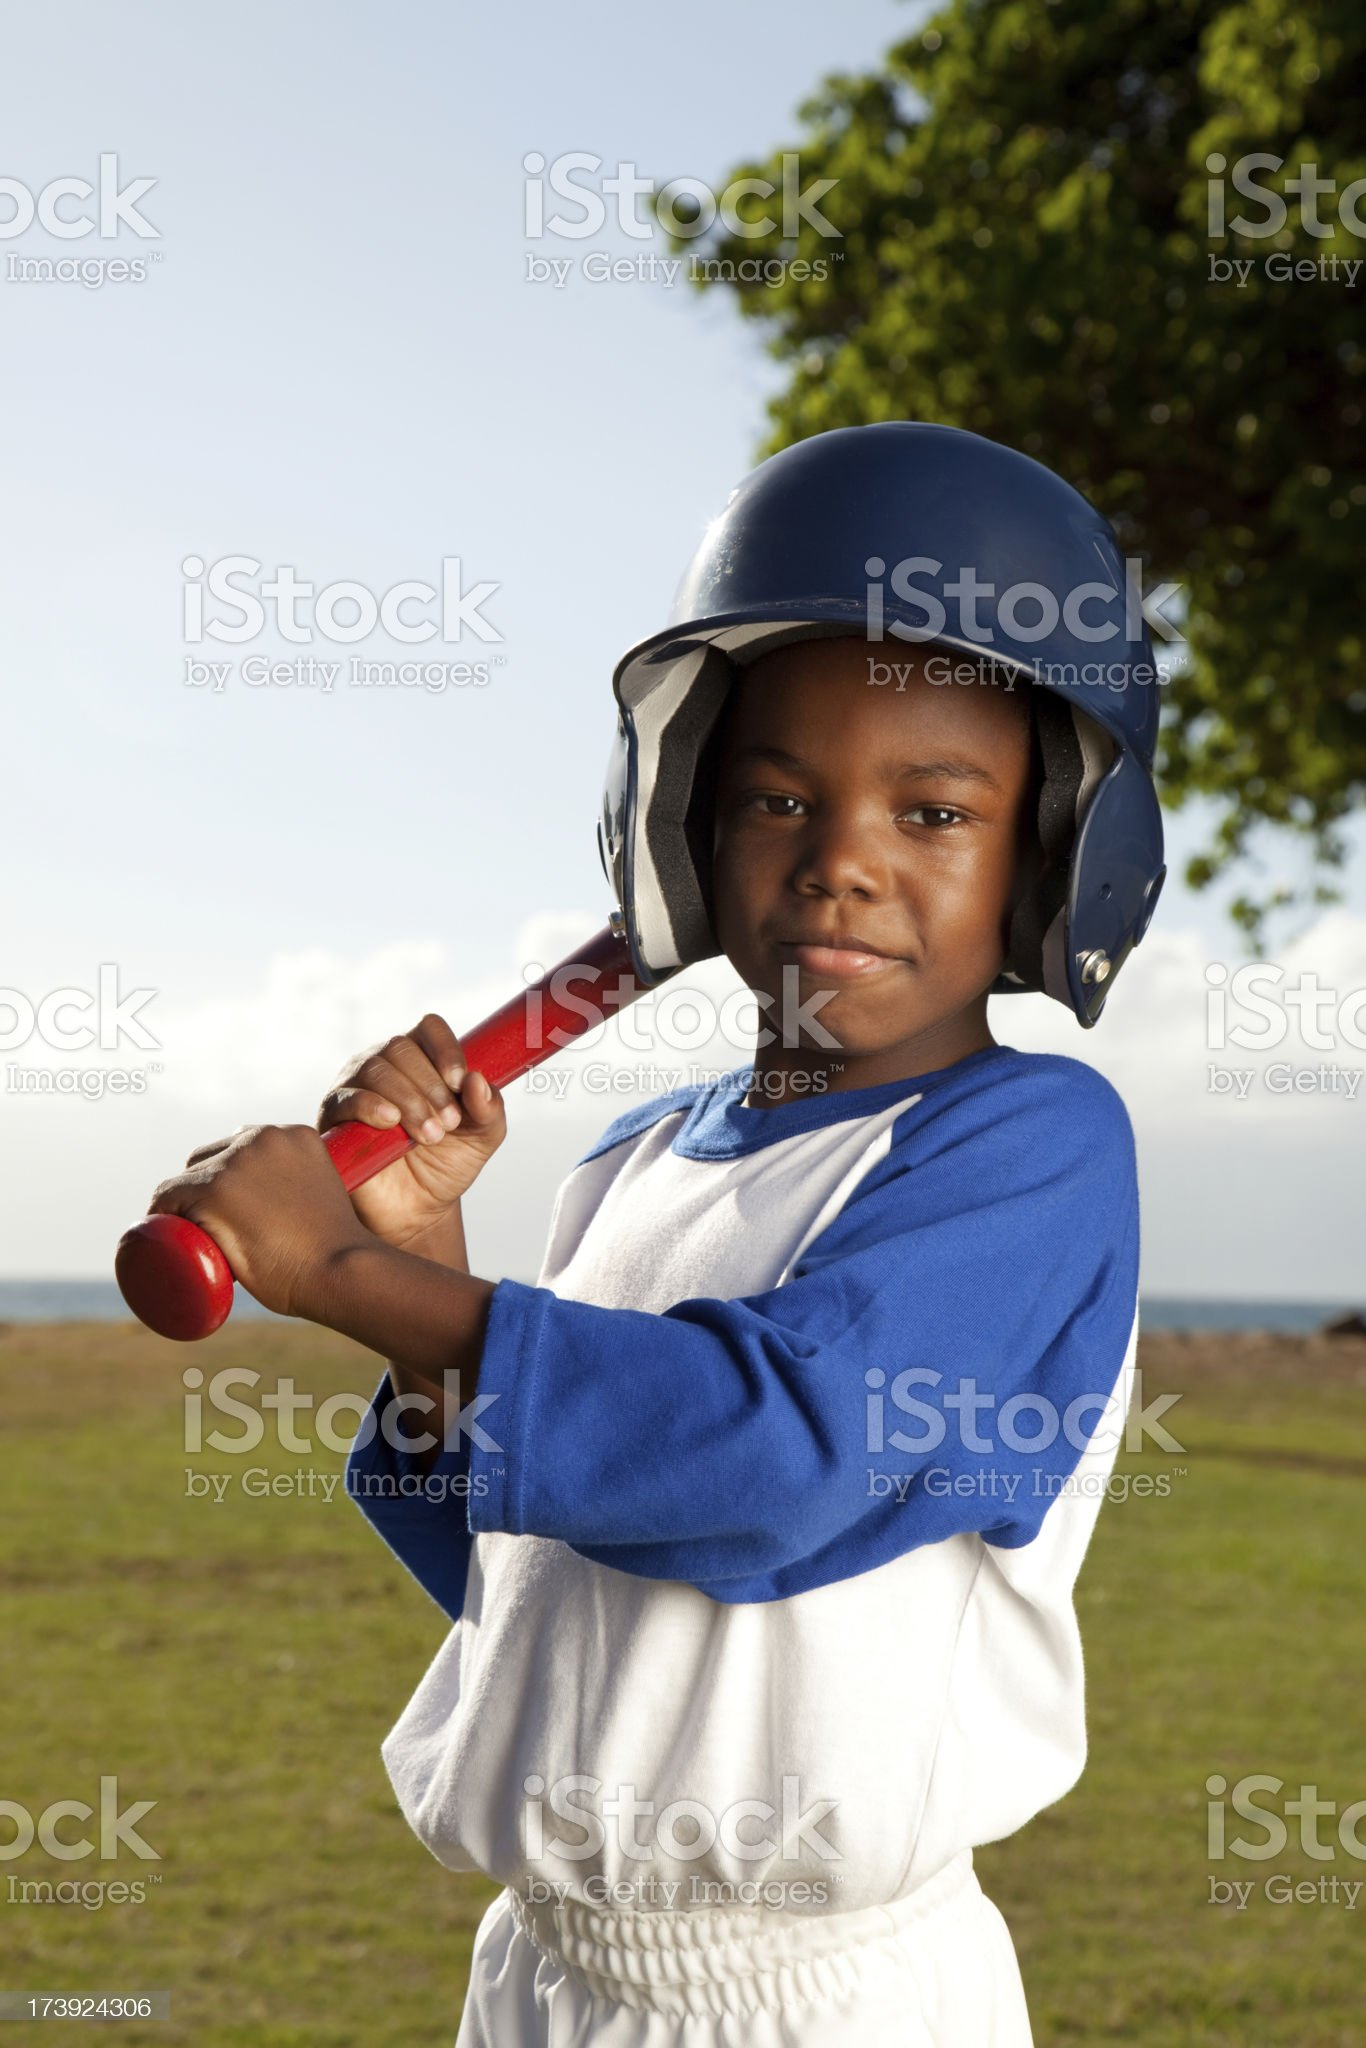 Baseball Kid royalty-free stock photo